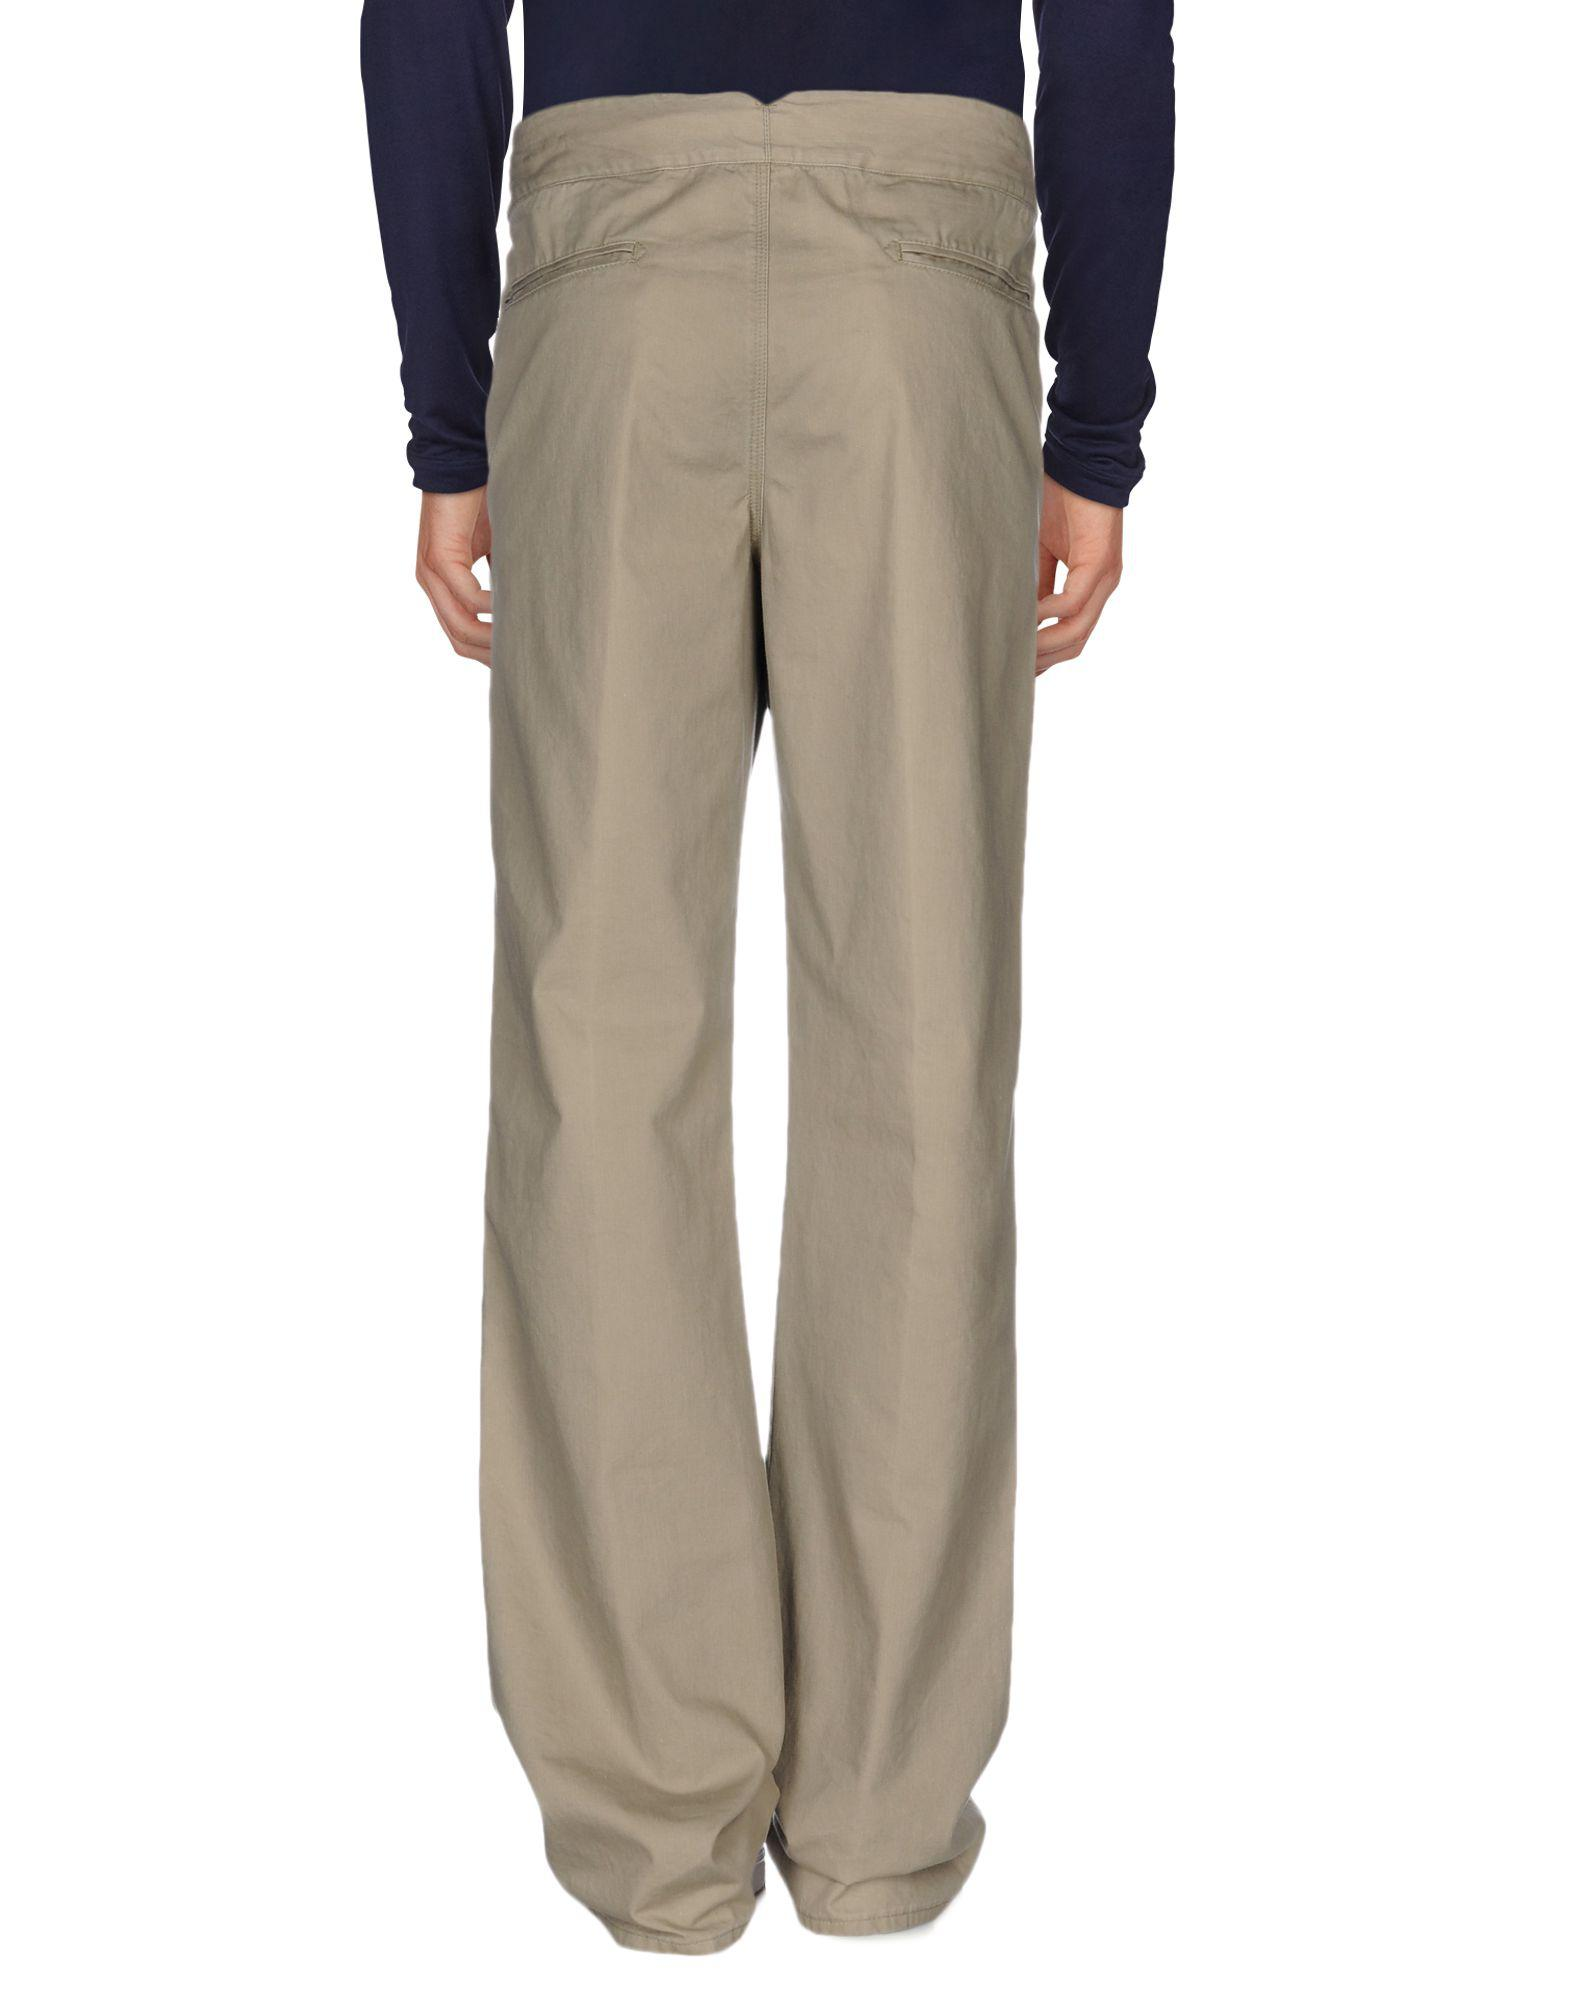 Golden Goose Deluxe Brand Denim Trousers in Sand (Natural) for Men